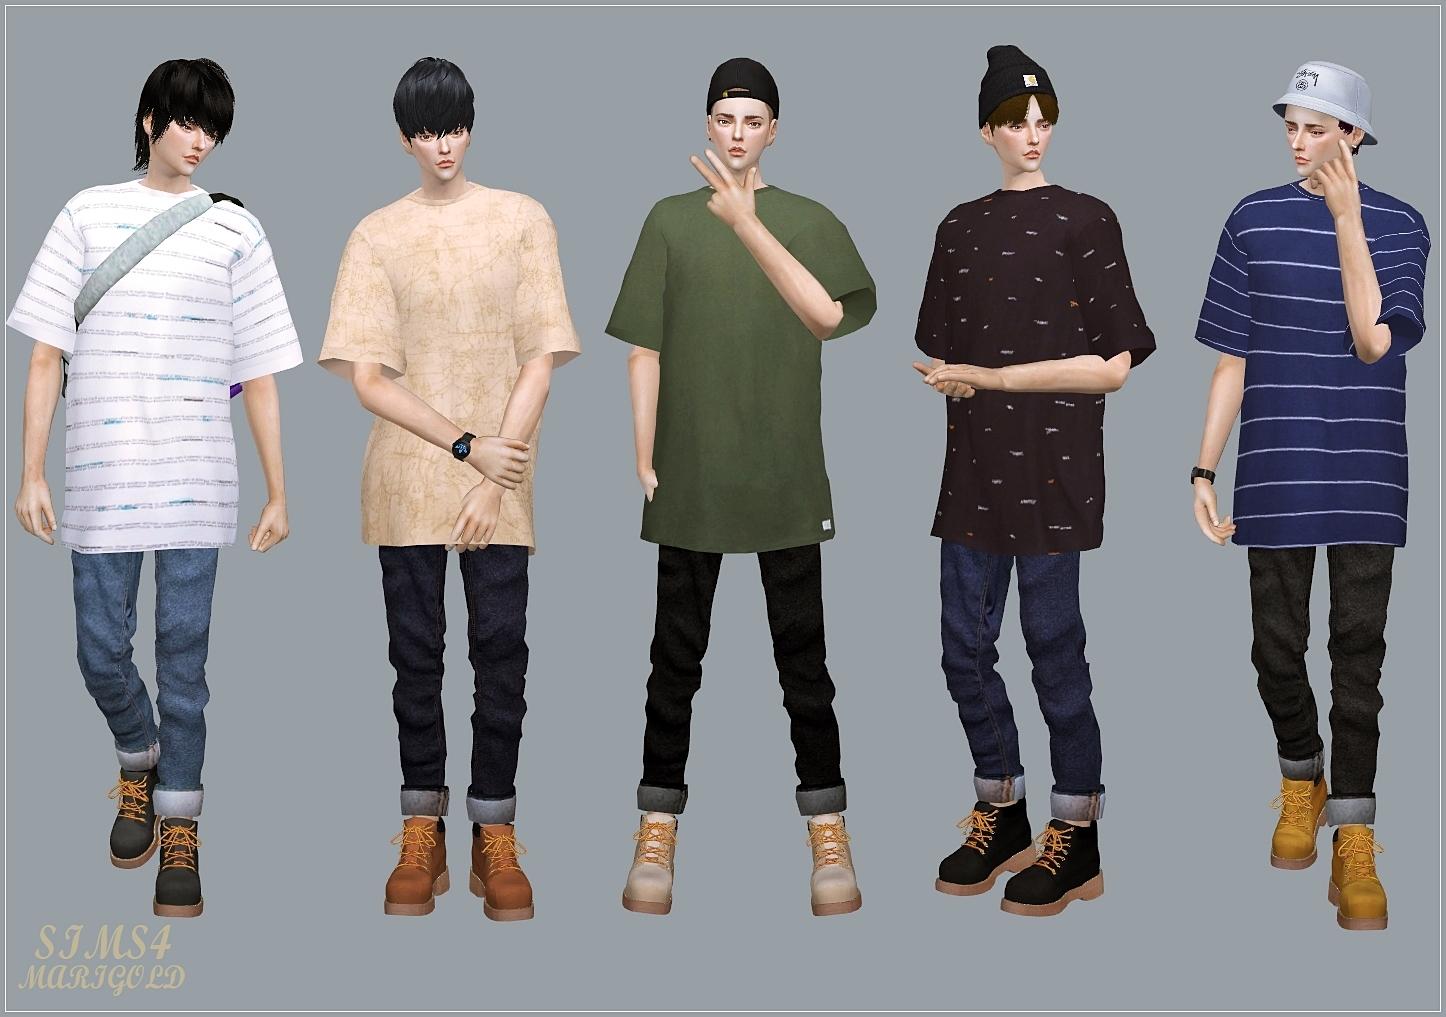 Sims 4 Male Blouse   RLDM